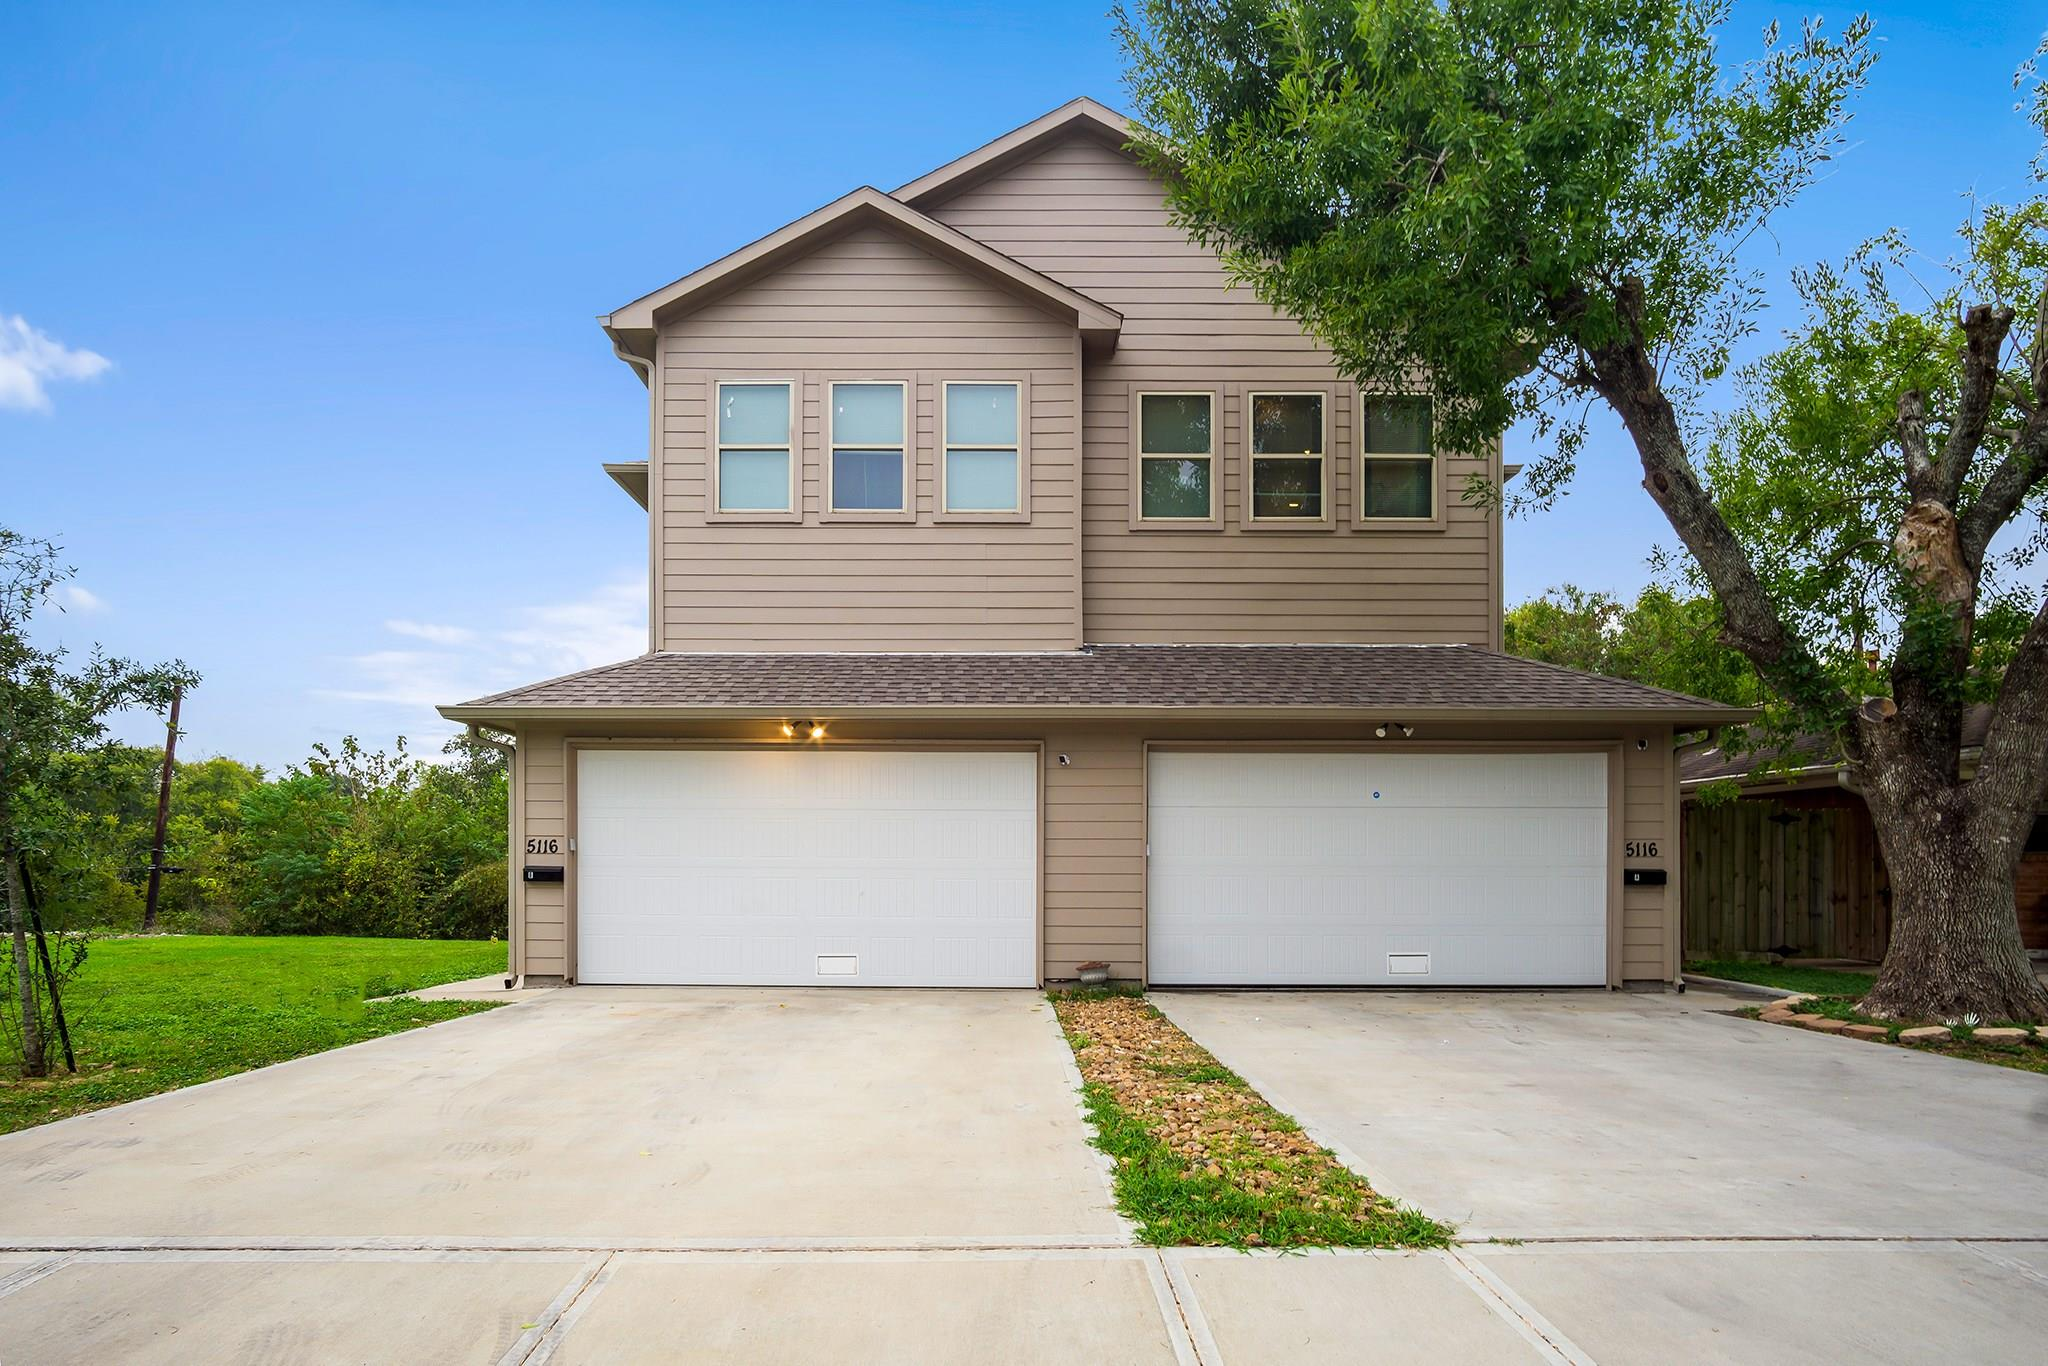 5116 Bosworth Street Property Photo - Houston, TX real estate listing